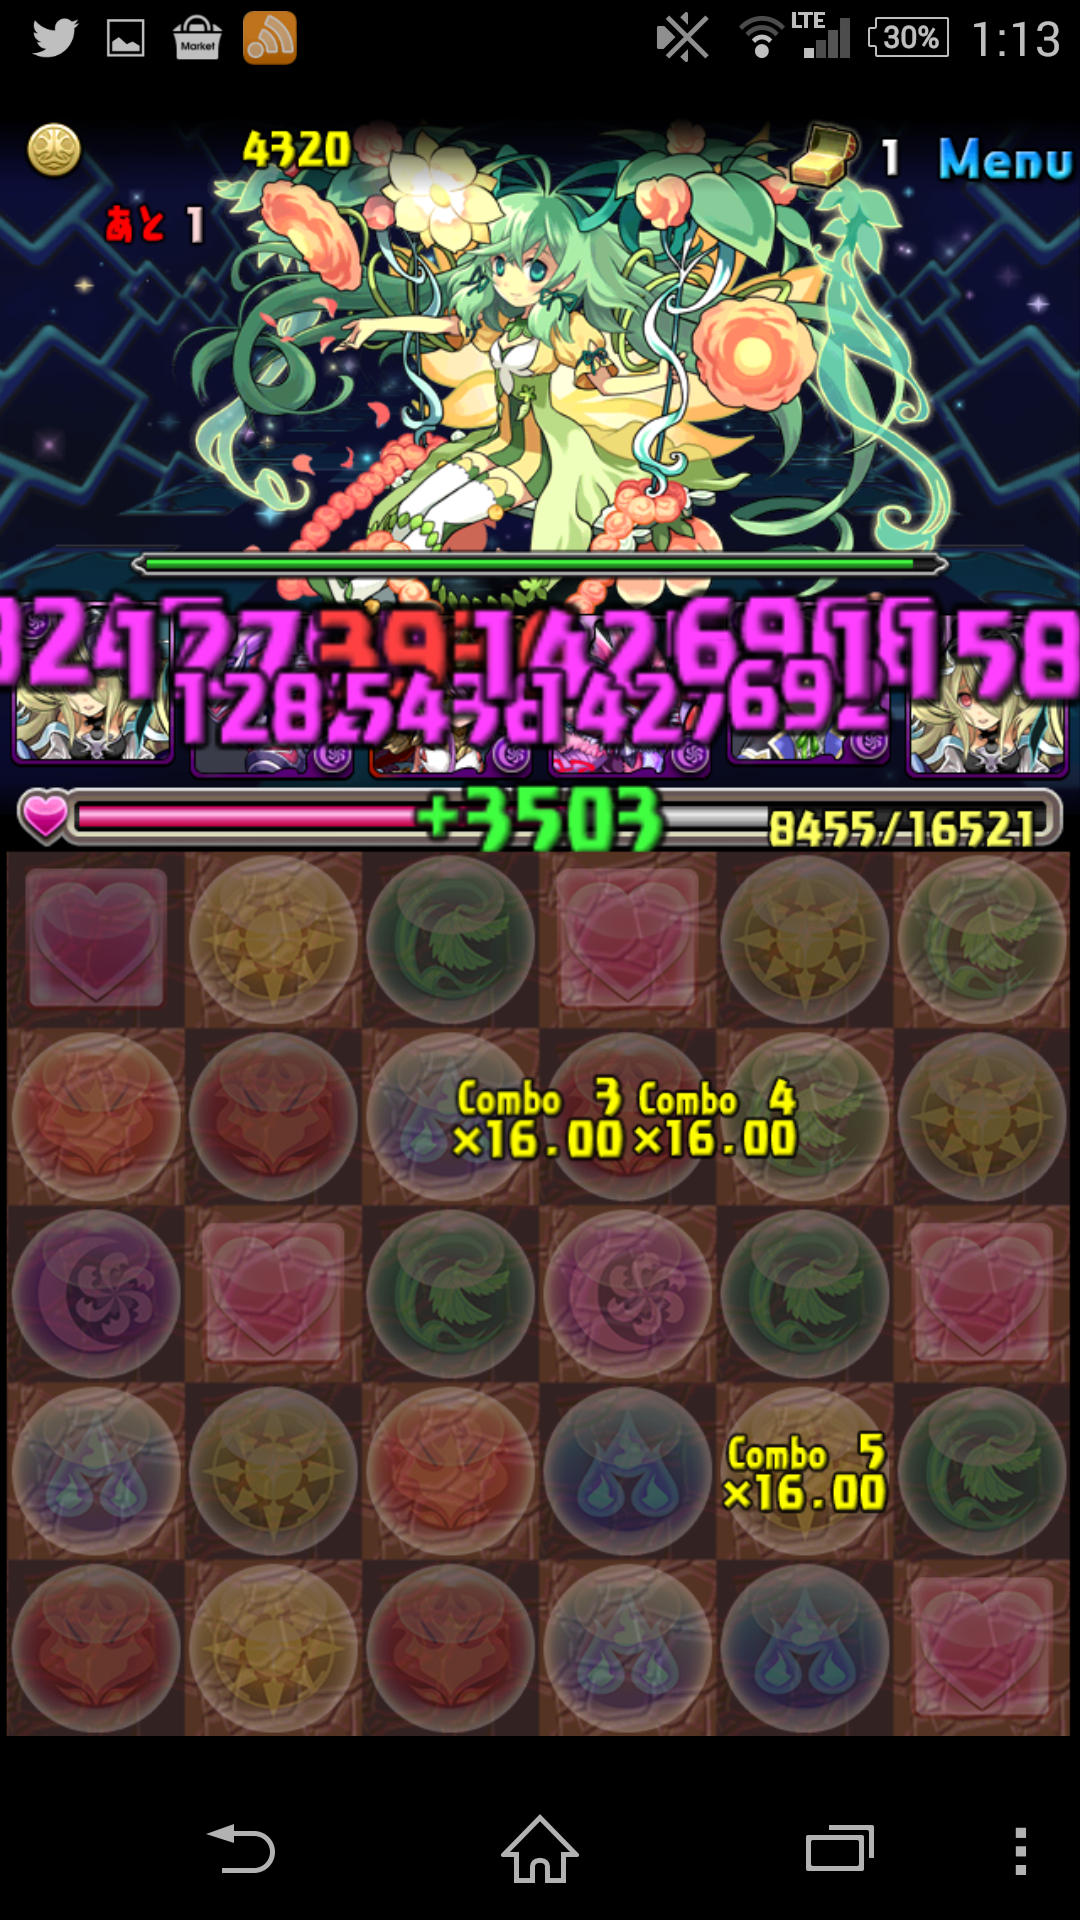 Screenshot_2014-12-19-01-13-09.png